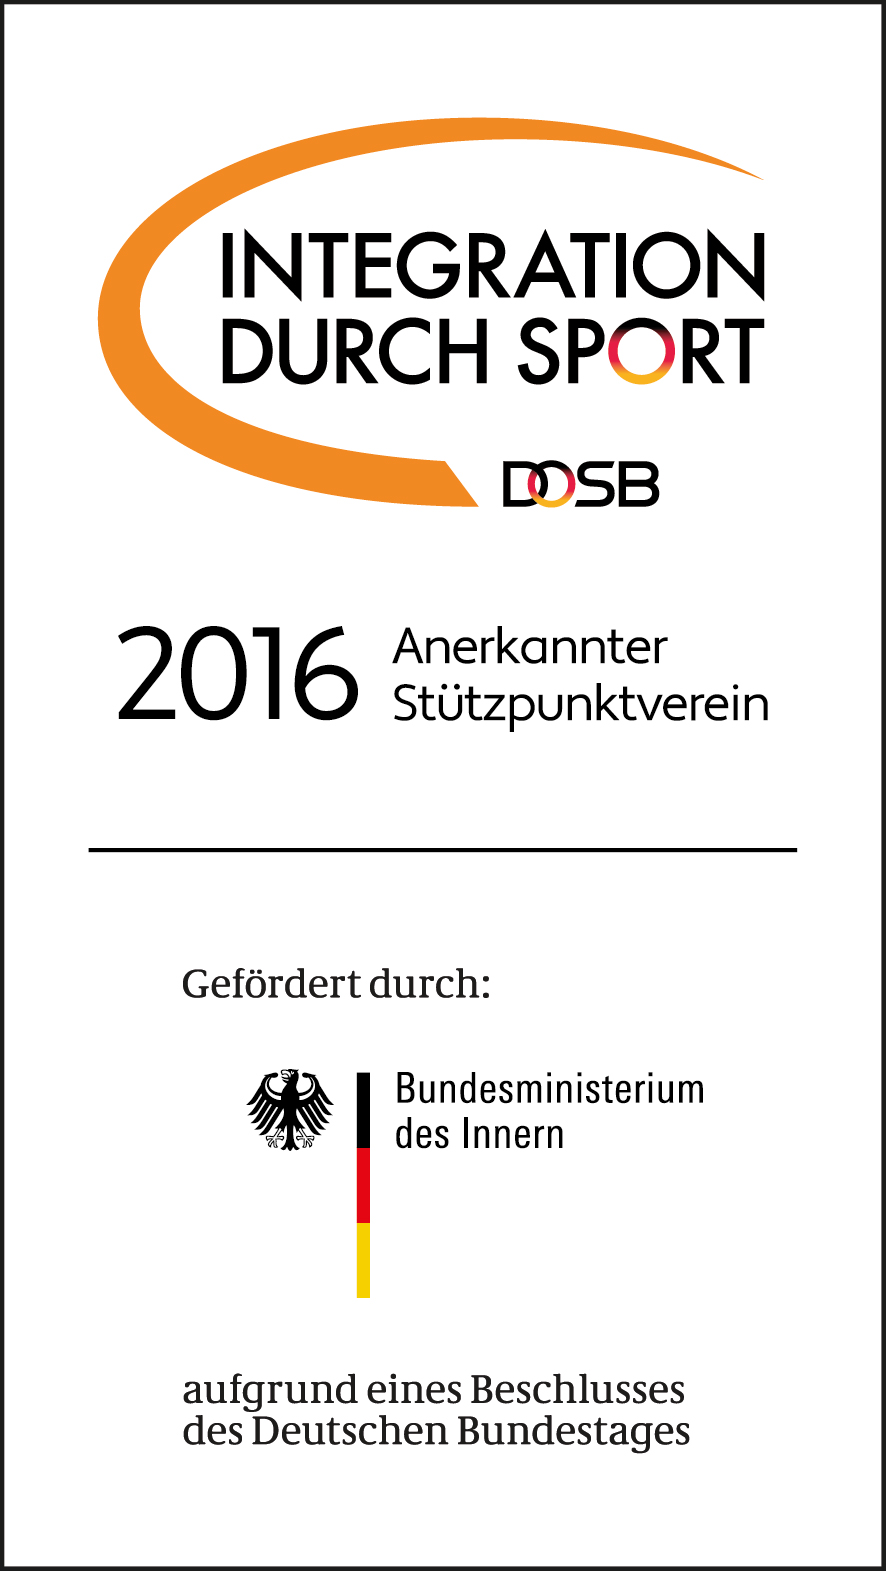 Logo Integration durch Sport 2016